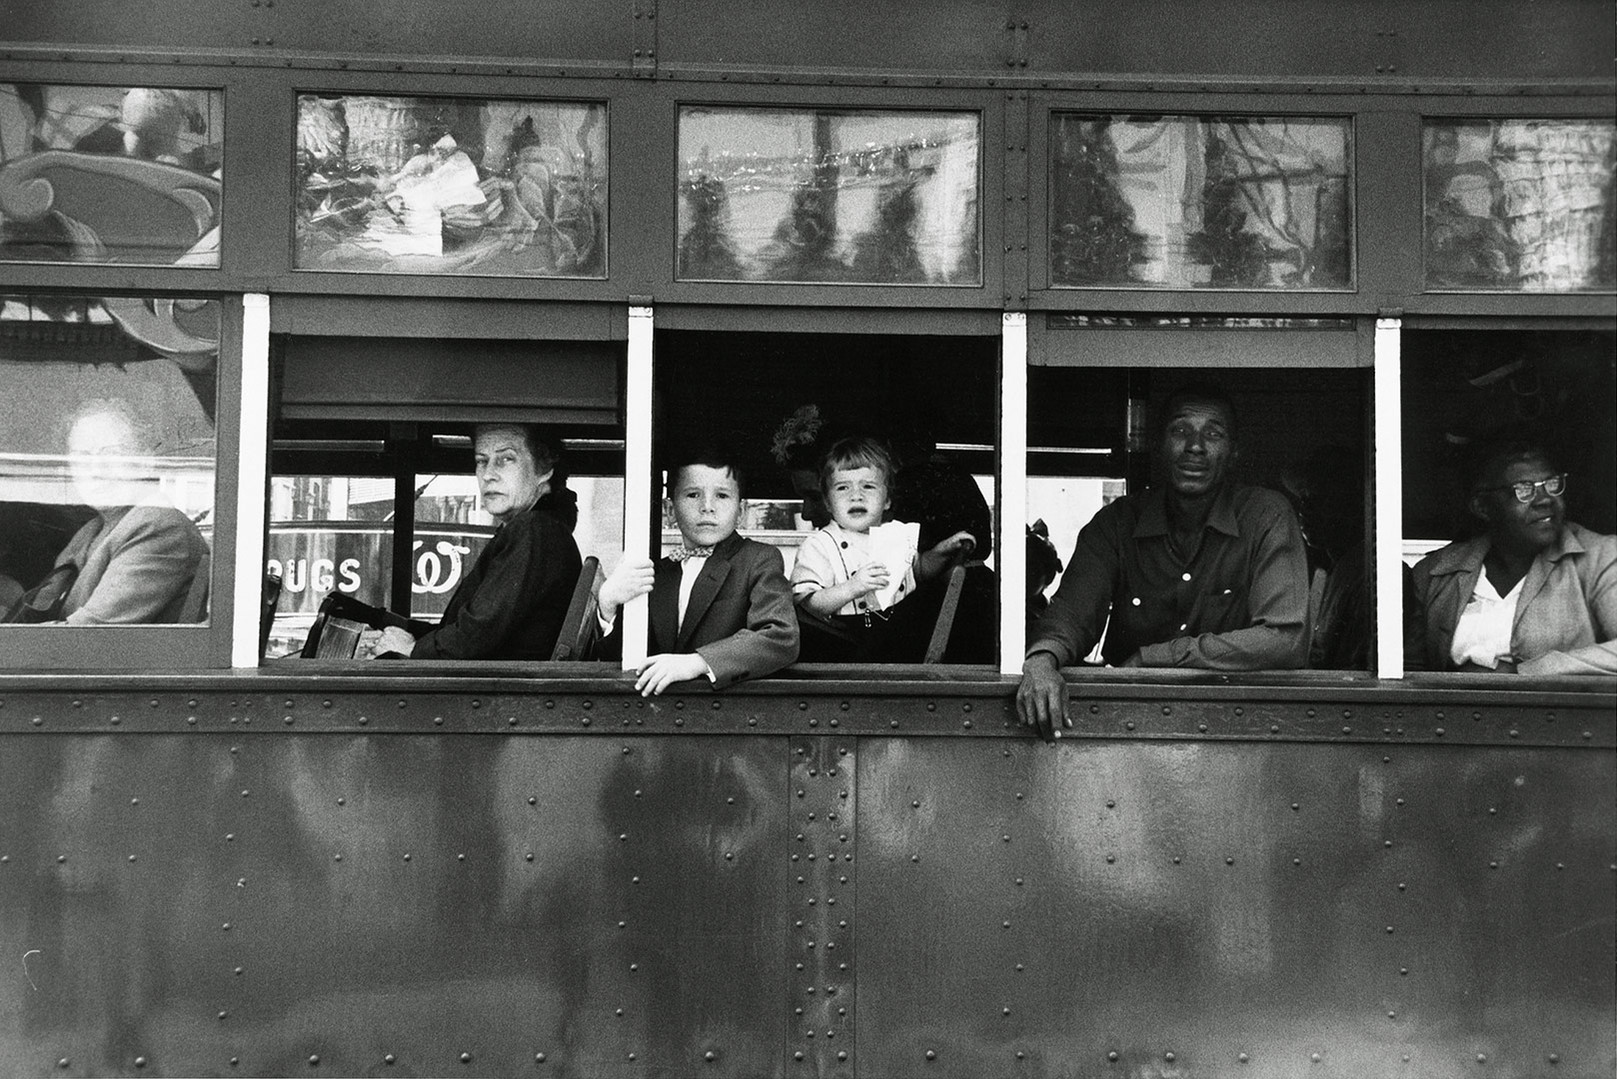 time-100-influential-photos-robert-frank